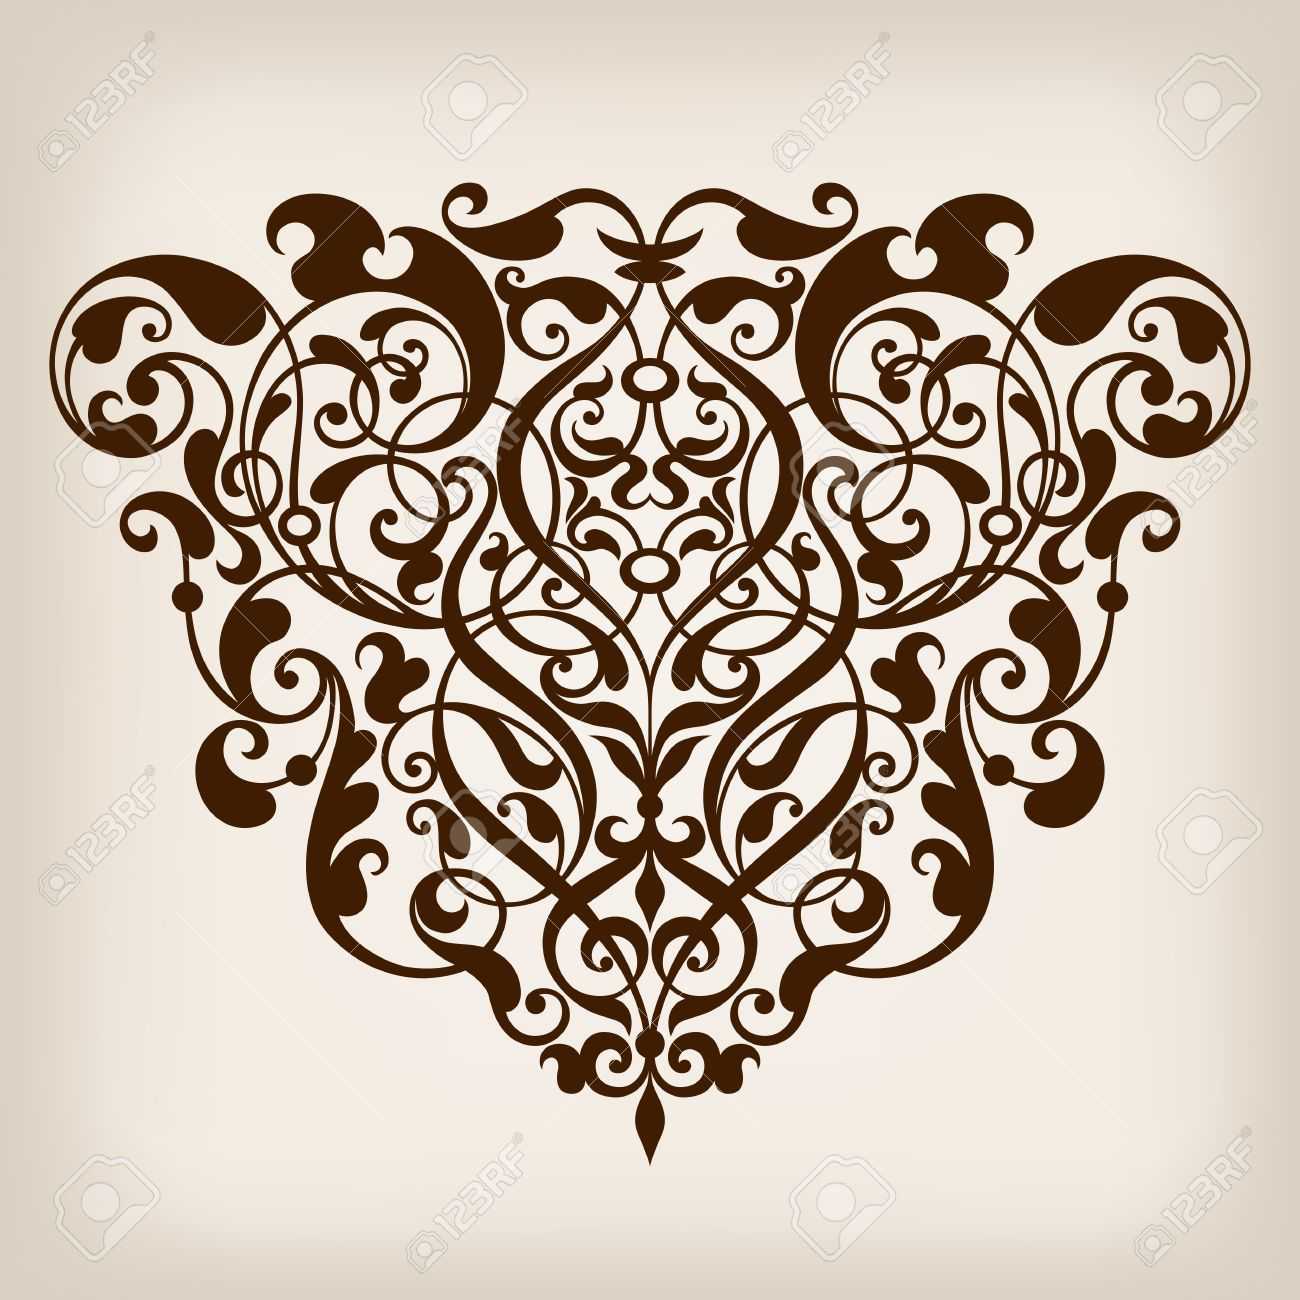 vector vintage Baroque scroll design frame border corner pattern element engraving retro style ornament - 27035834